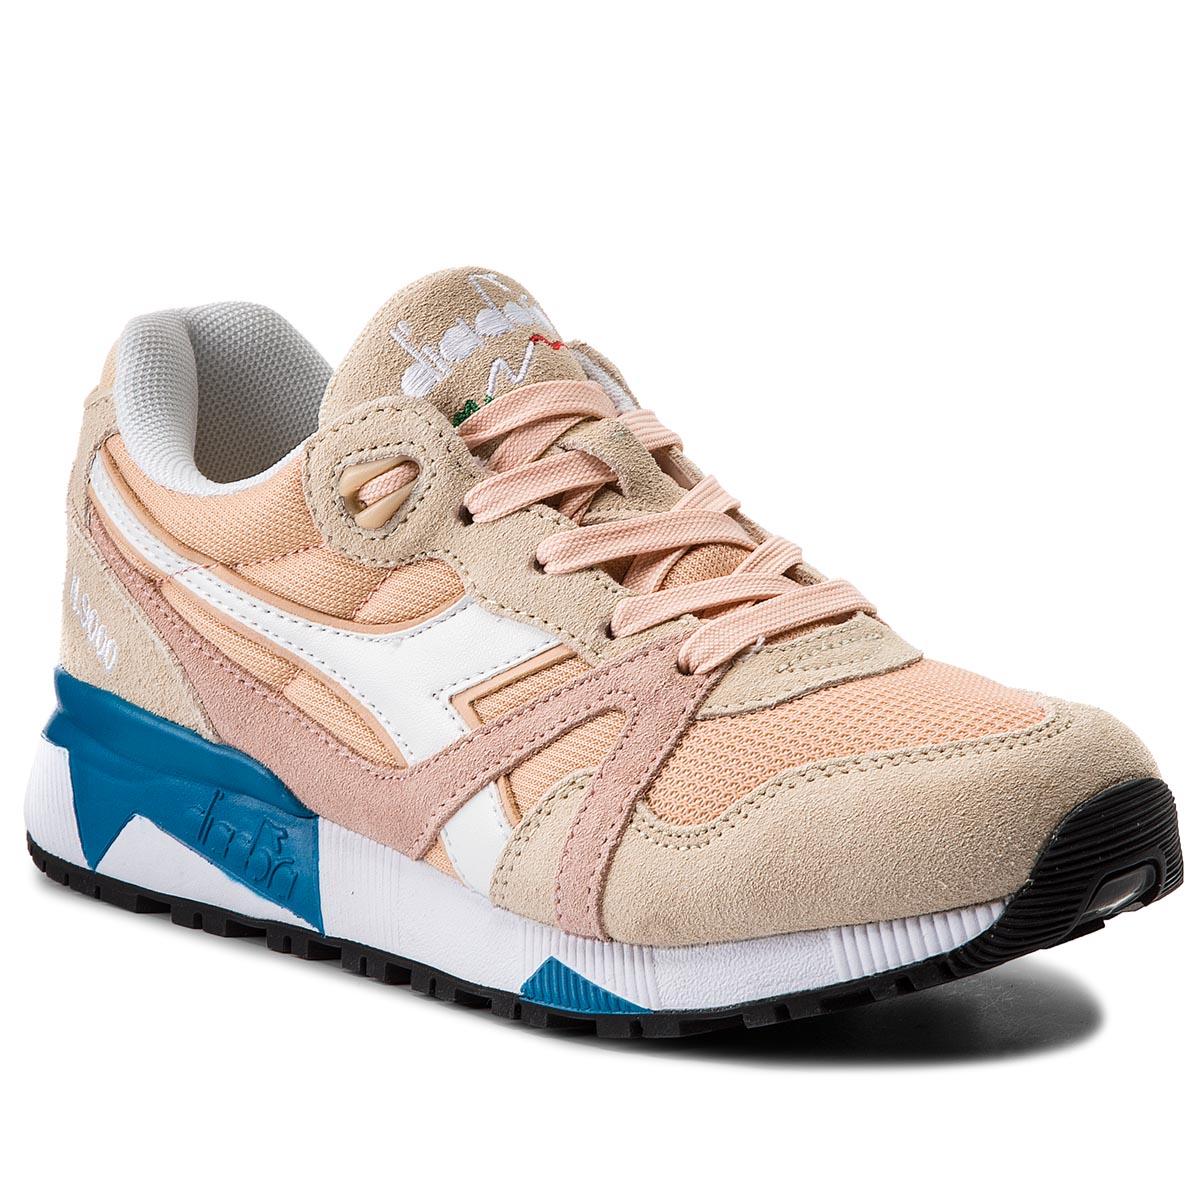 C5746 Greygrey Diadora N9000 501 Sneakers 01 Paloma Iii 171853 vNm8nyOP0w